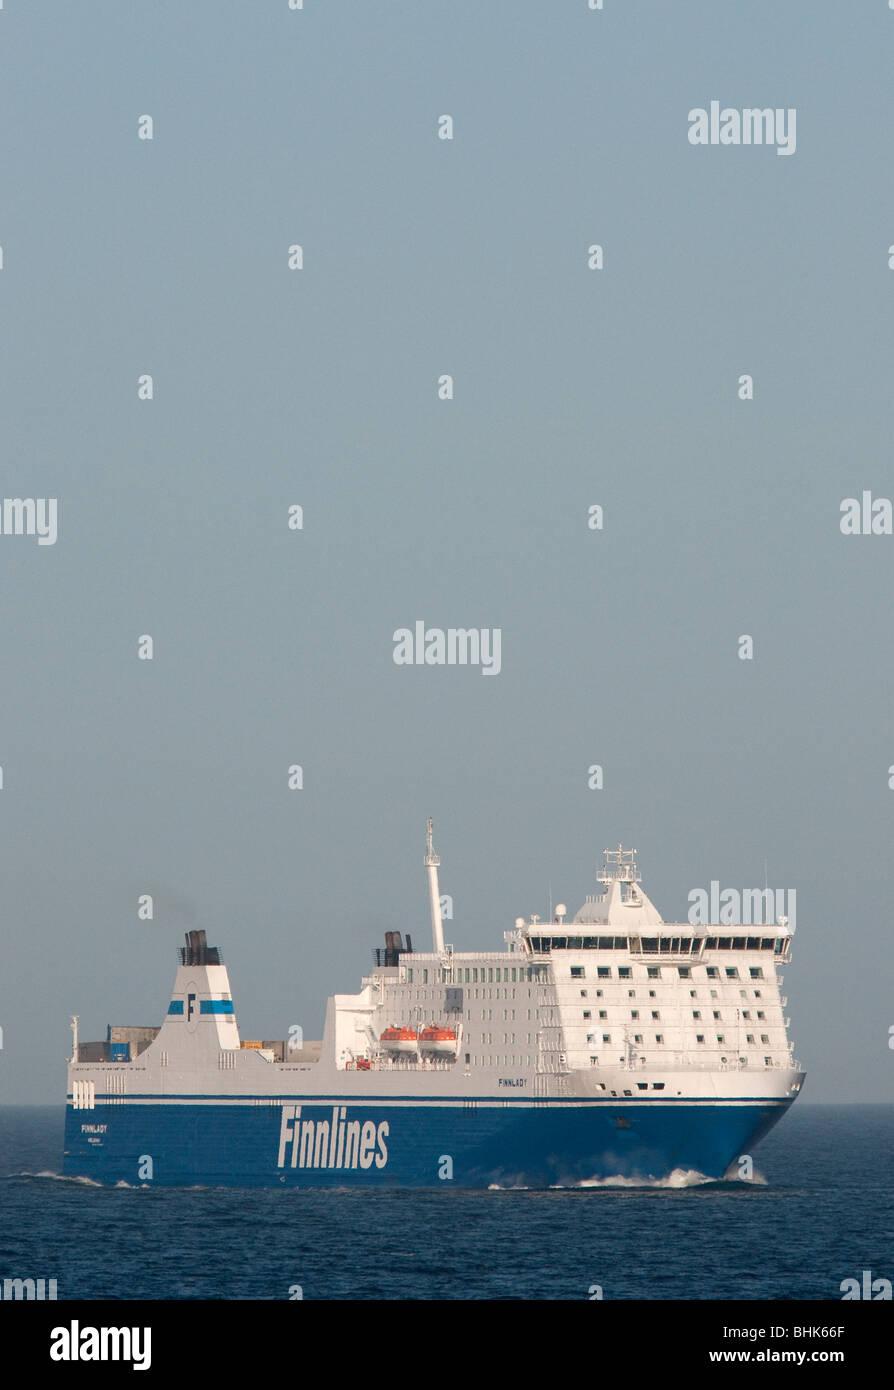 The Finnlines ro/pax-ferry Finnlady. - Stock Image